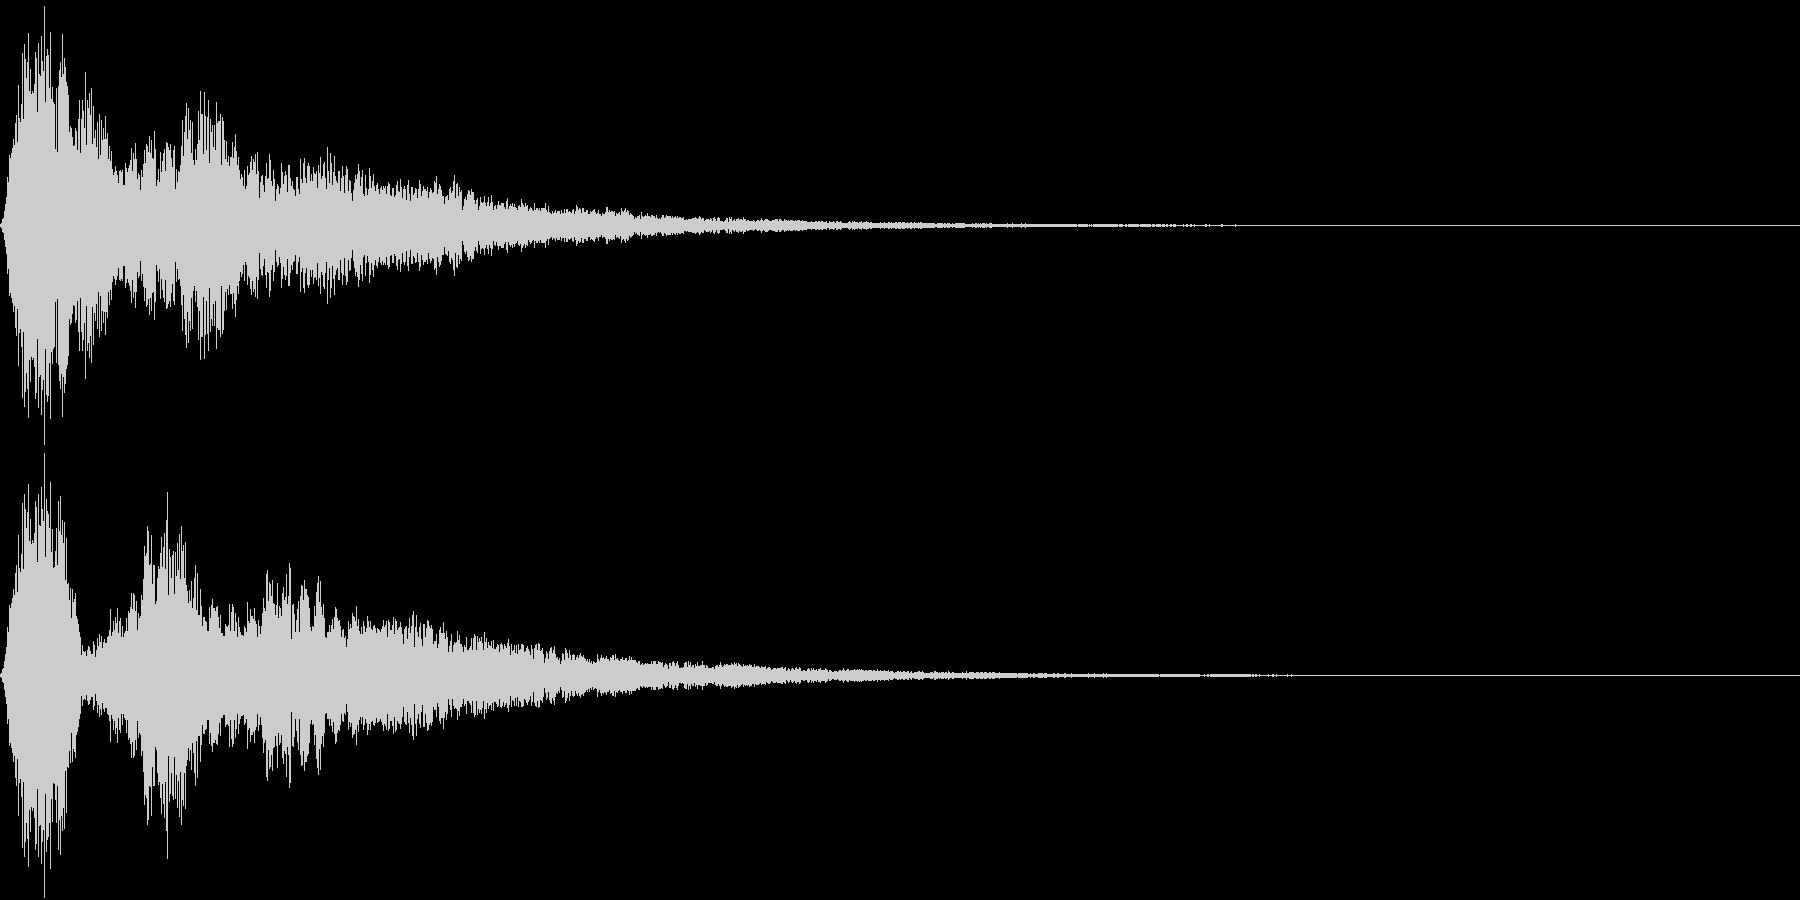 EMail 送受信音 シャリーンの未再生の波形